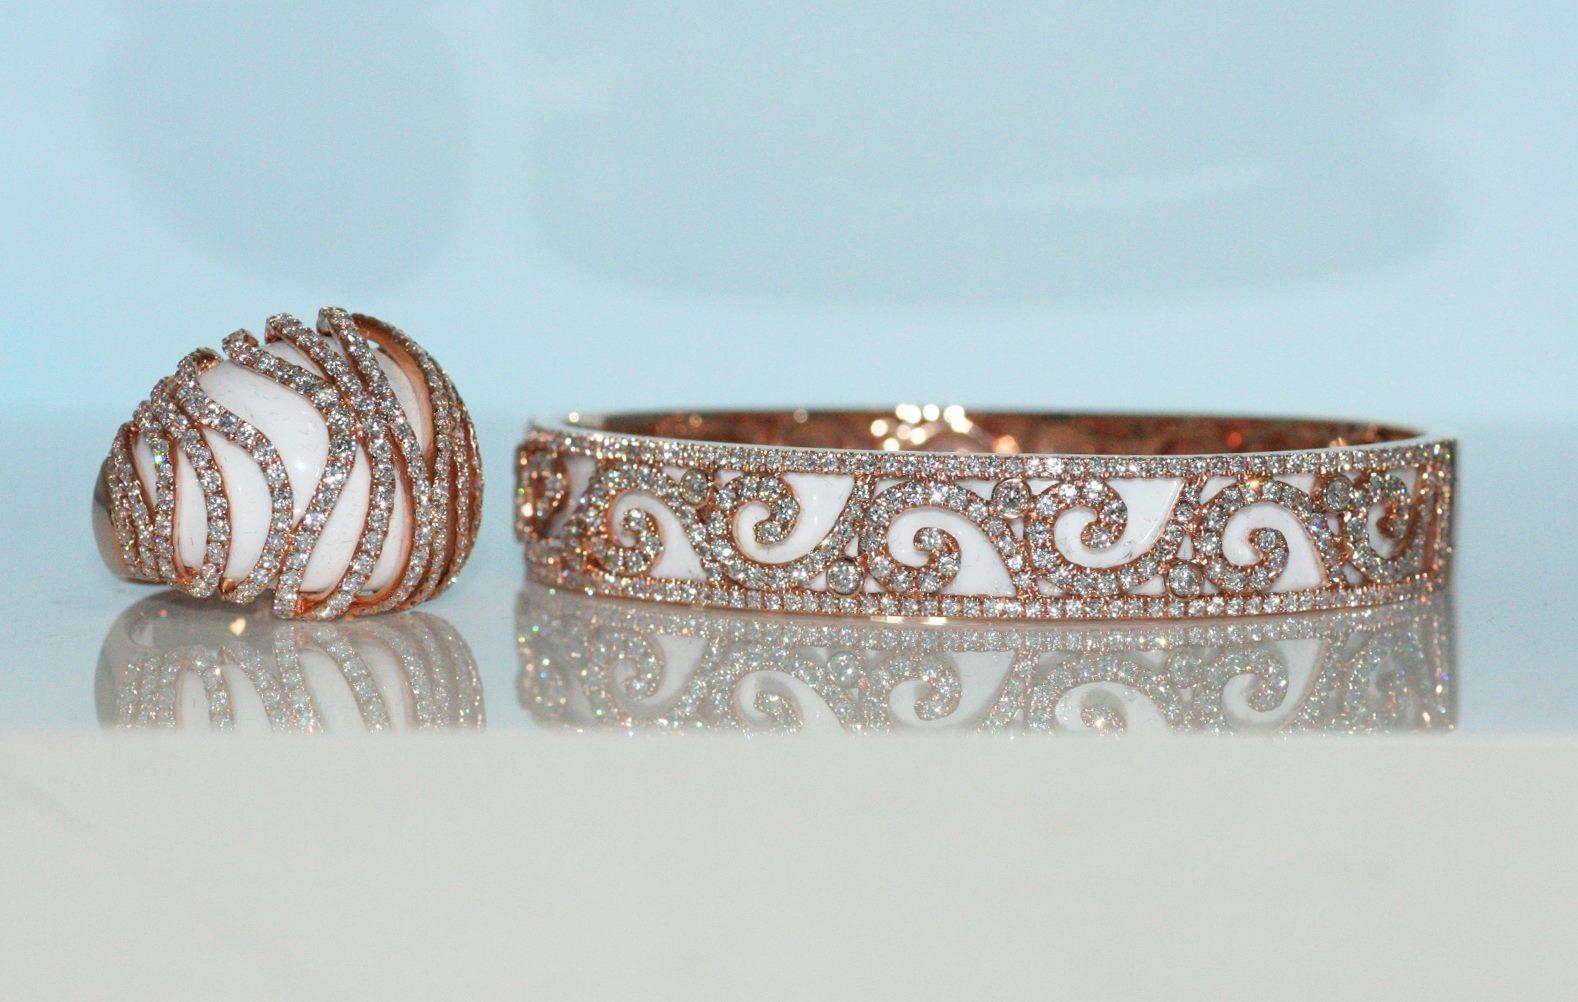 Matching ring and Bangle set